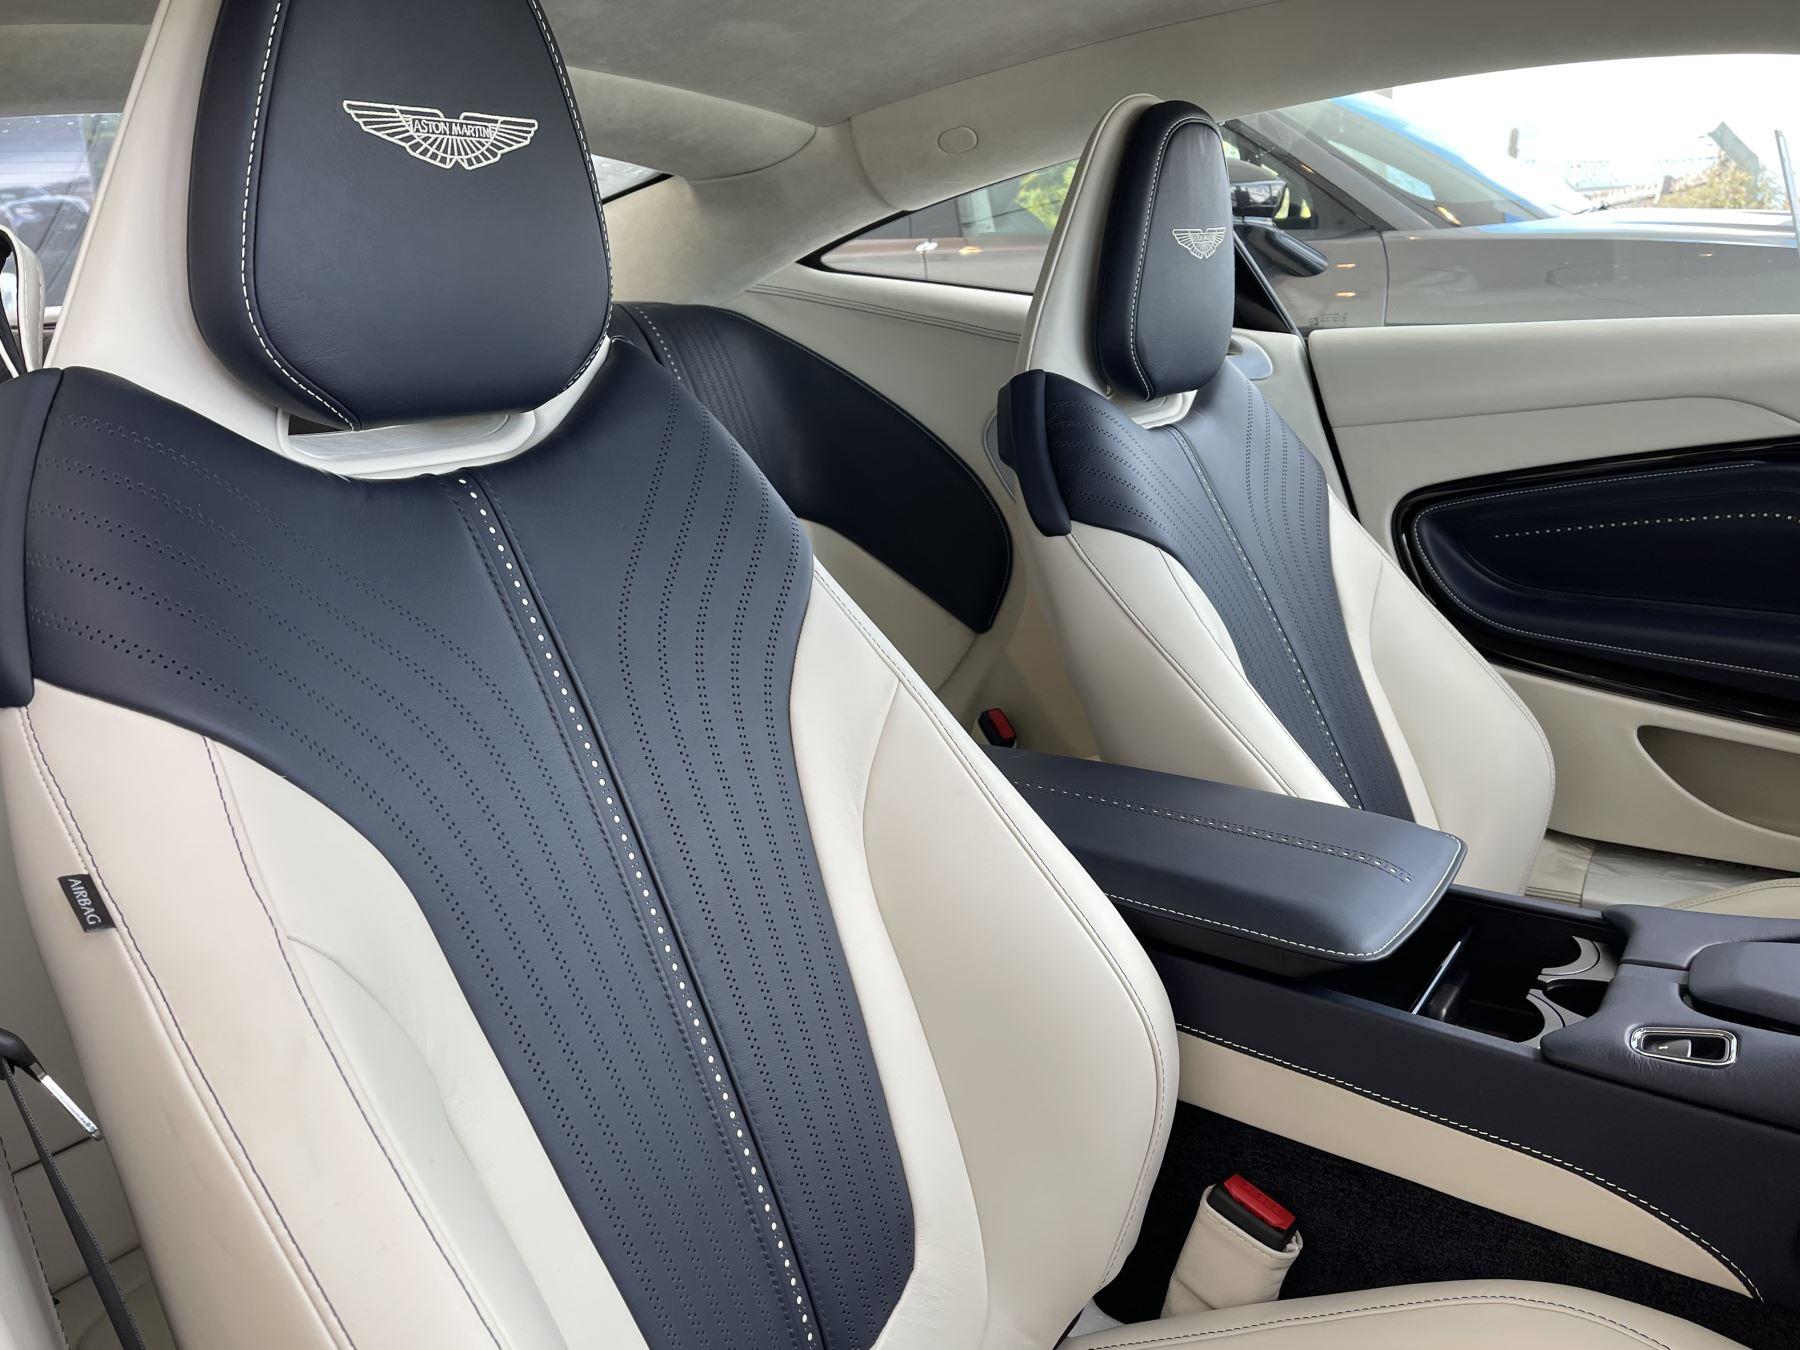 Aston Martin DB11 V8 Touchtronic image 6